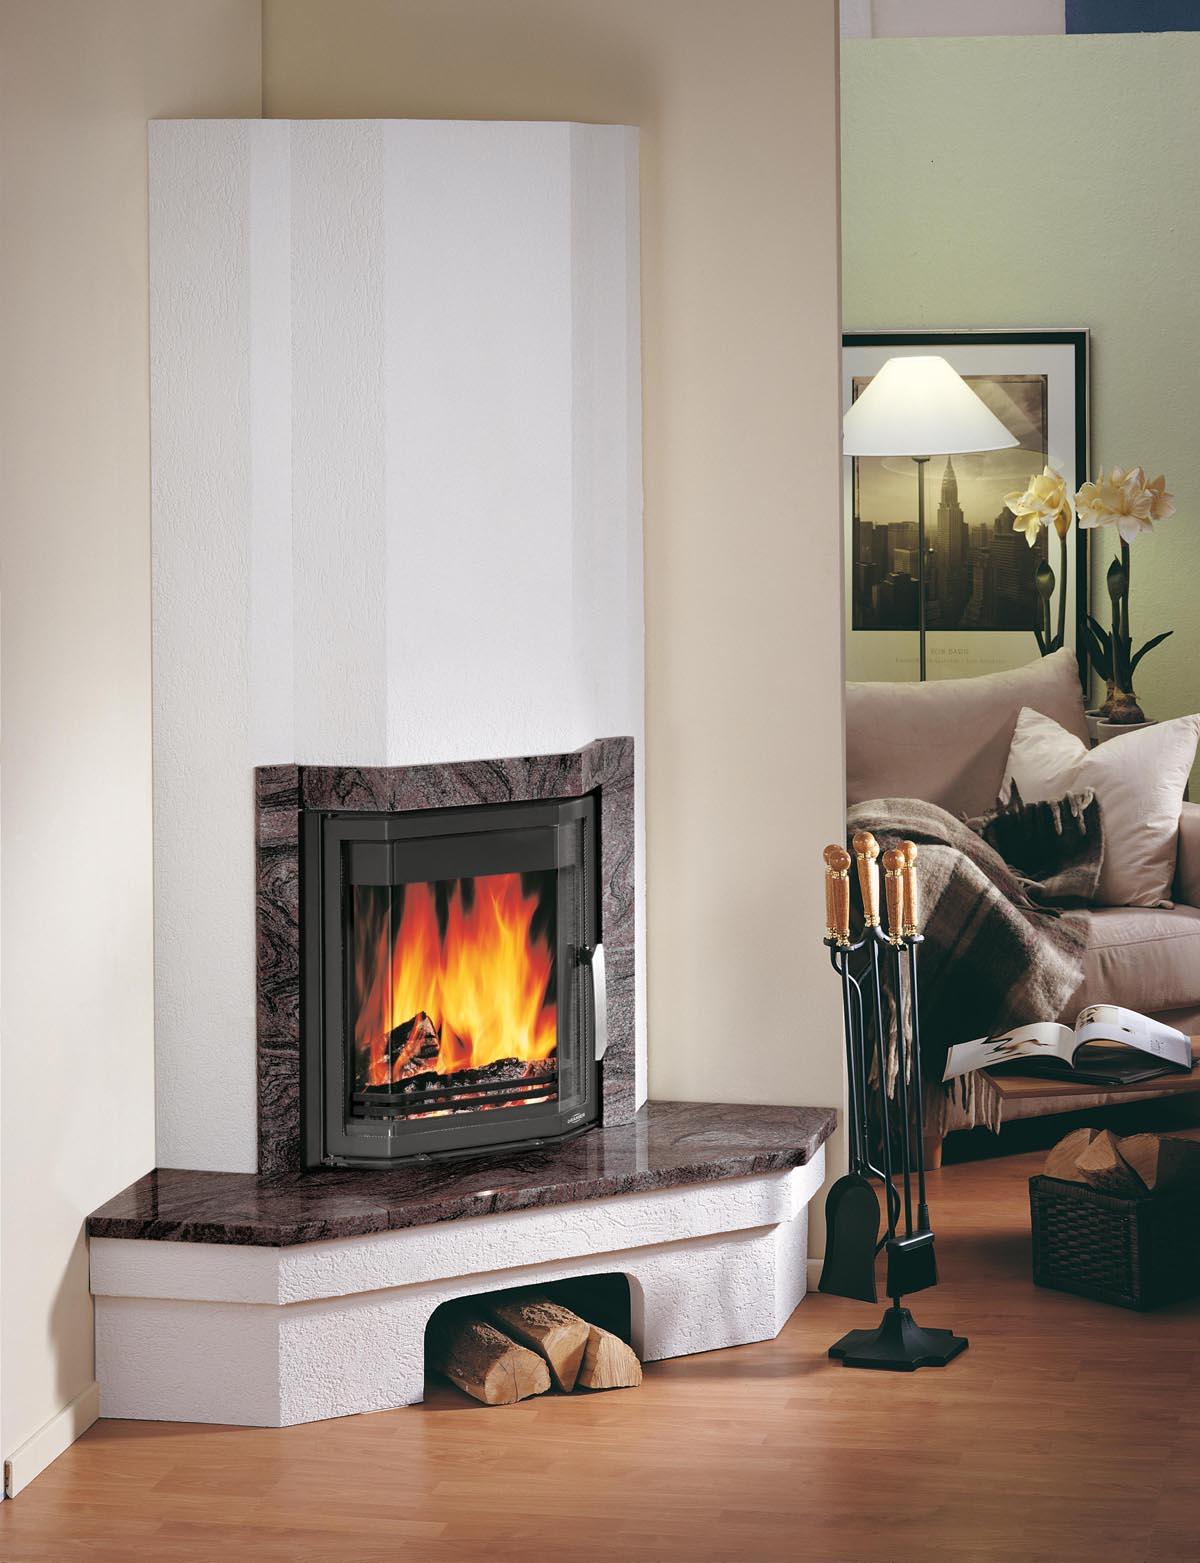 kamine gala classic eck granit schwarz komplettkamin. Black Bedroom Furniture Sets. Home Design Ideas